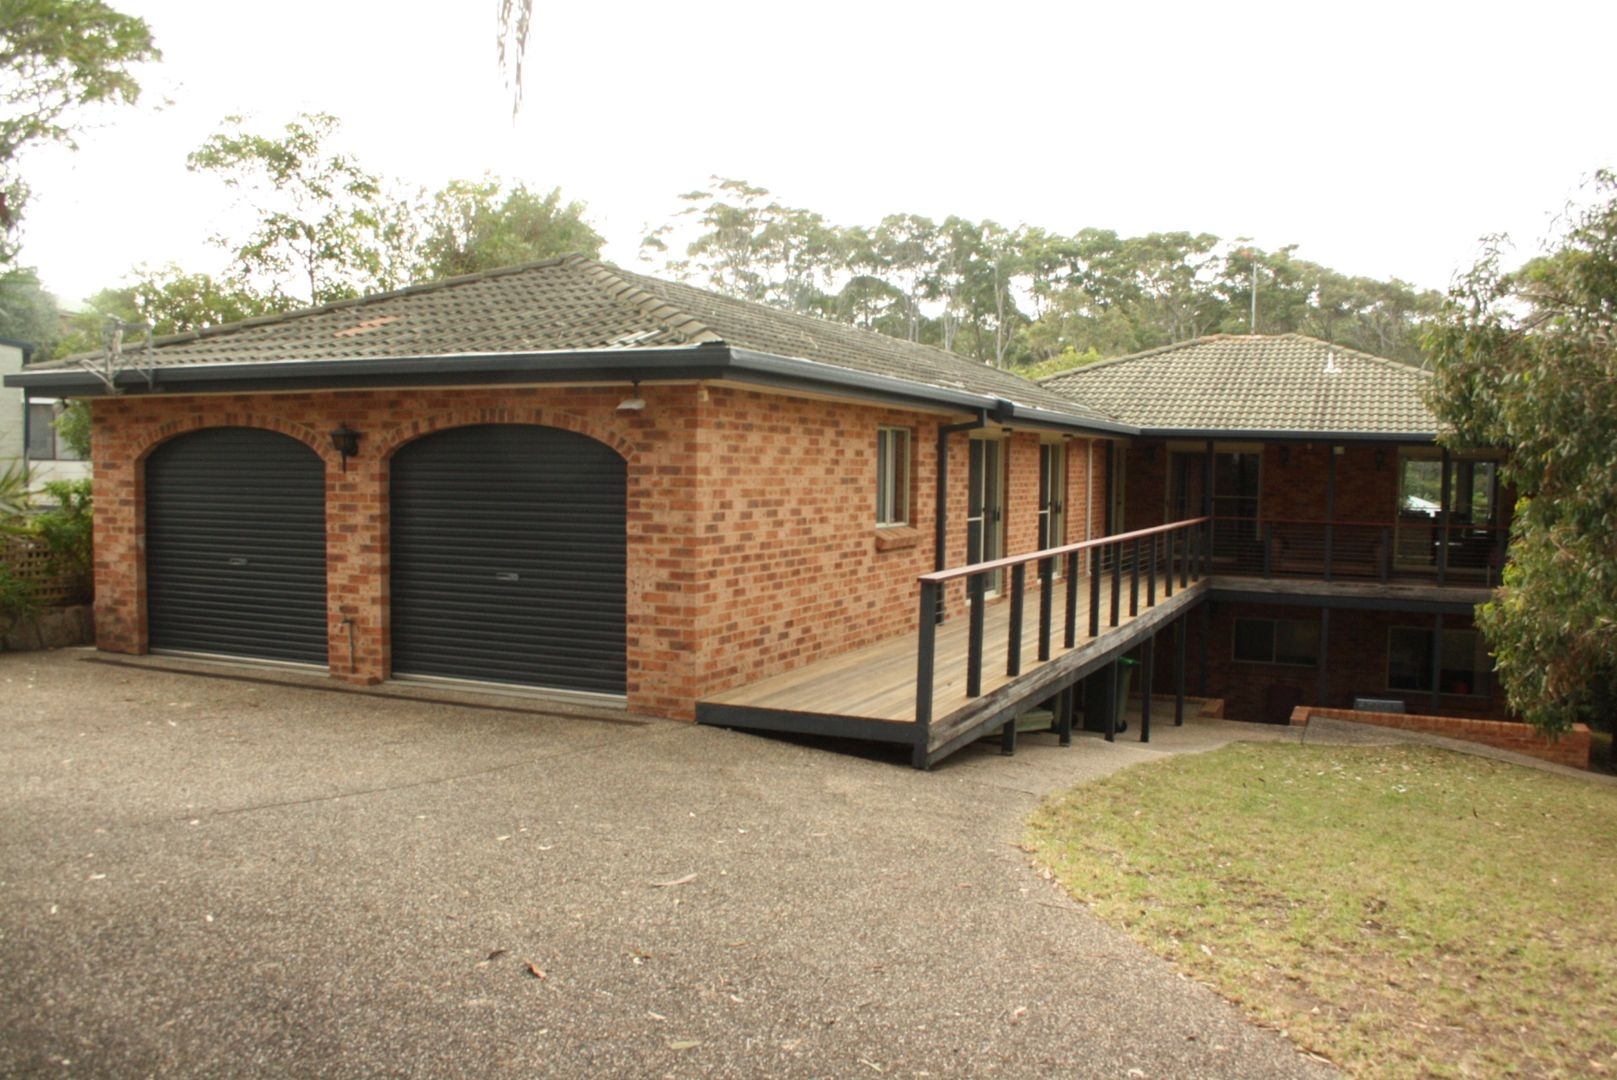 2/350 George Bass  Drive, Lilli Pilli NSW 2536, Image 1